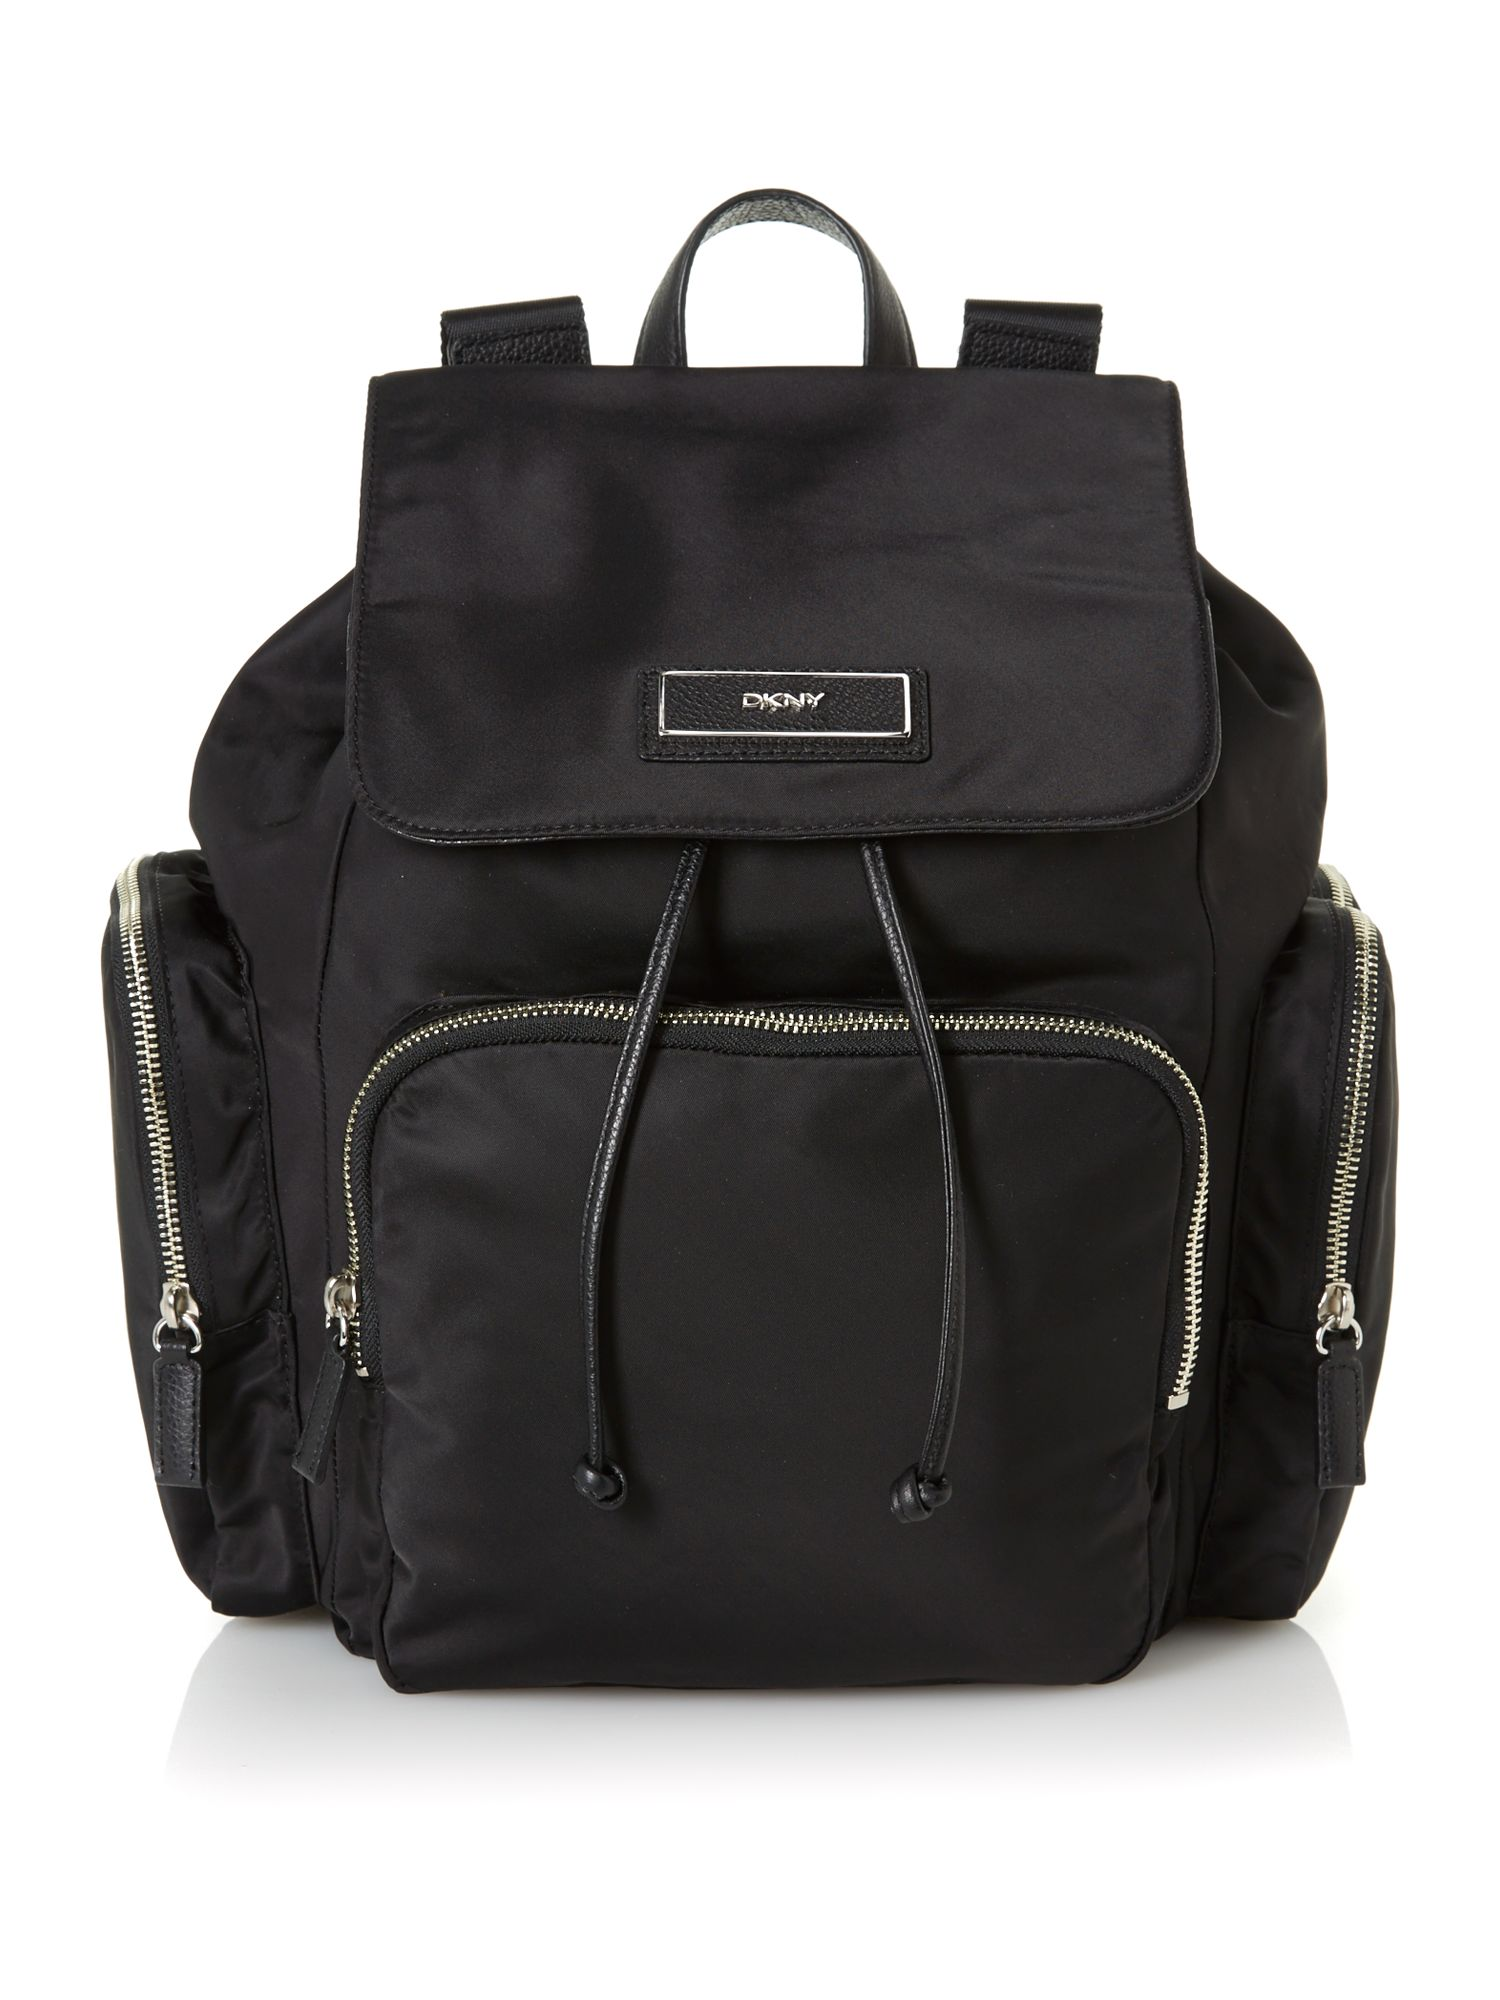 DKNY Black Large Tassel Backpack